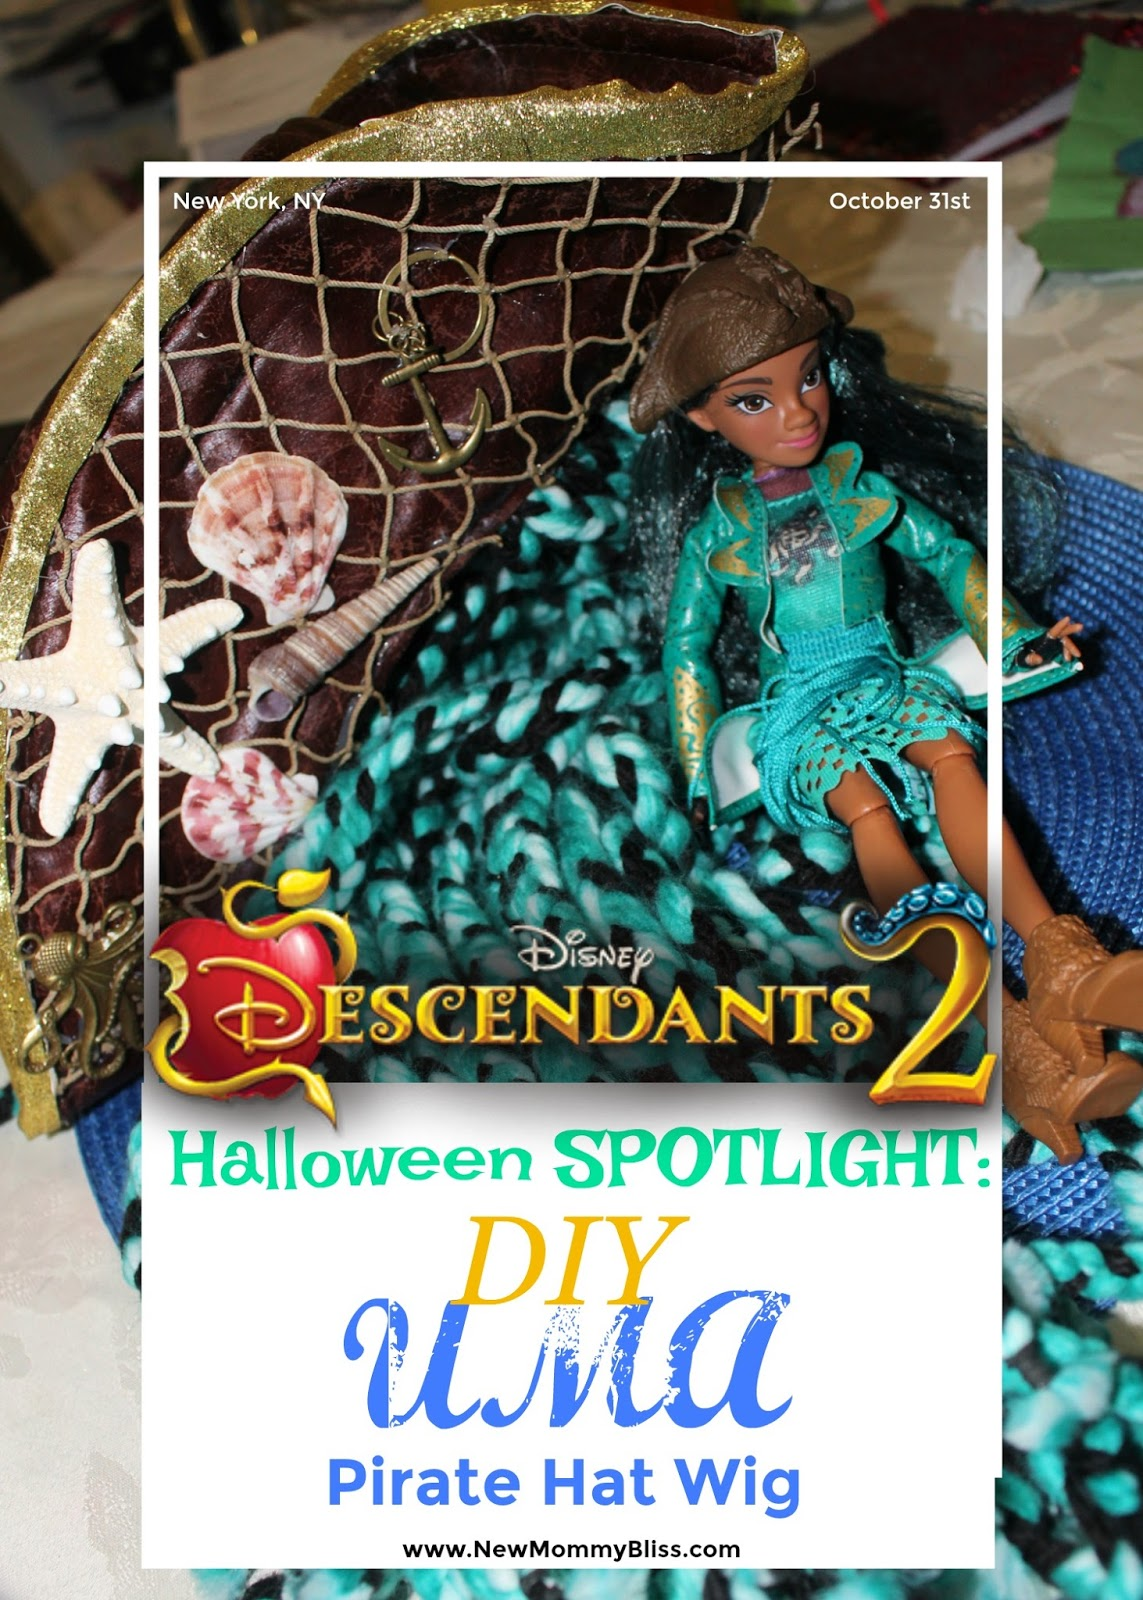 Halloween SPOTLIGHT: DIY UMA Descendants 2 Pirate Hat Wig